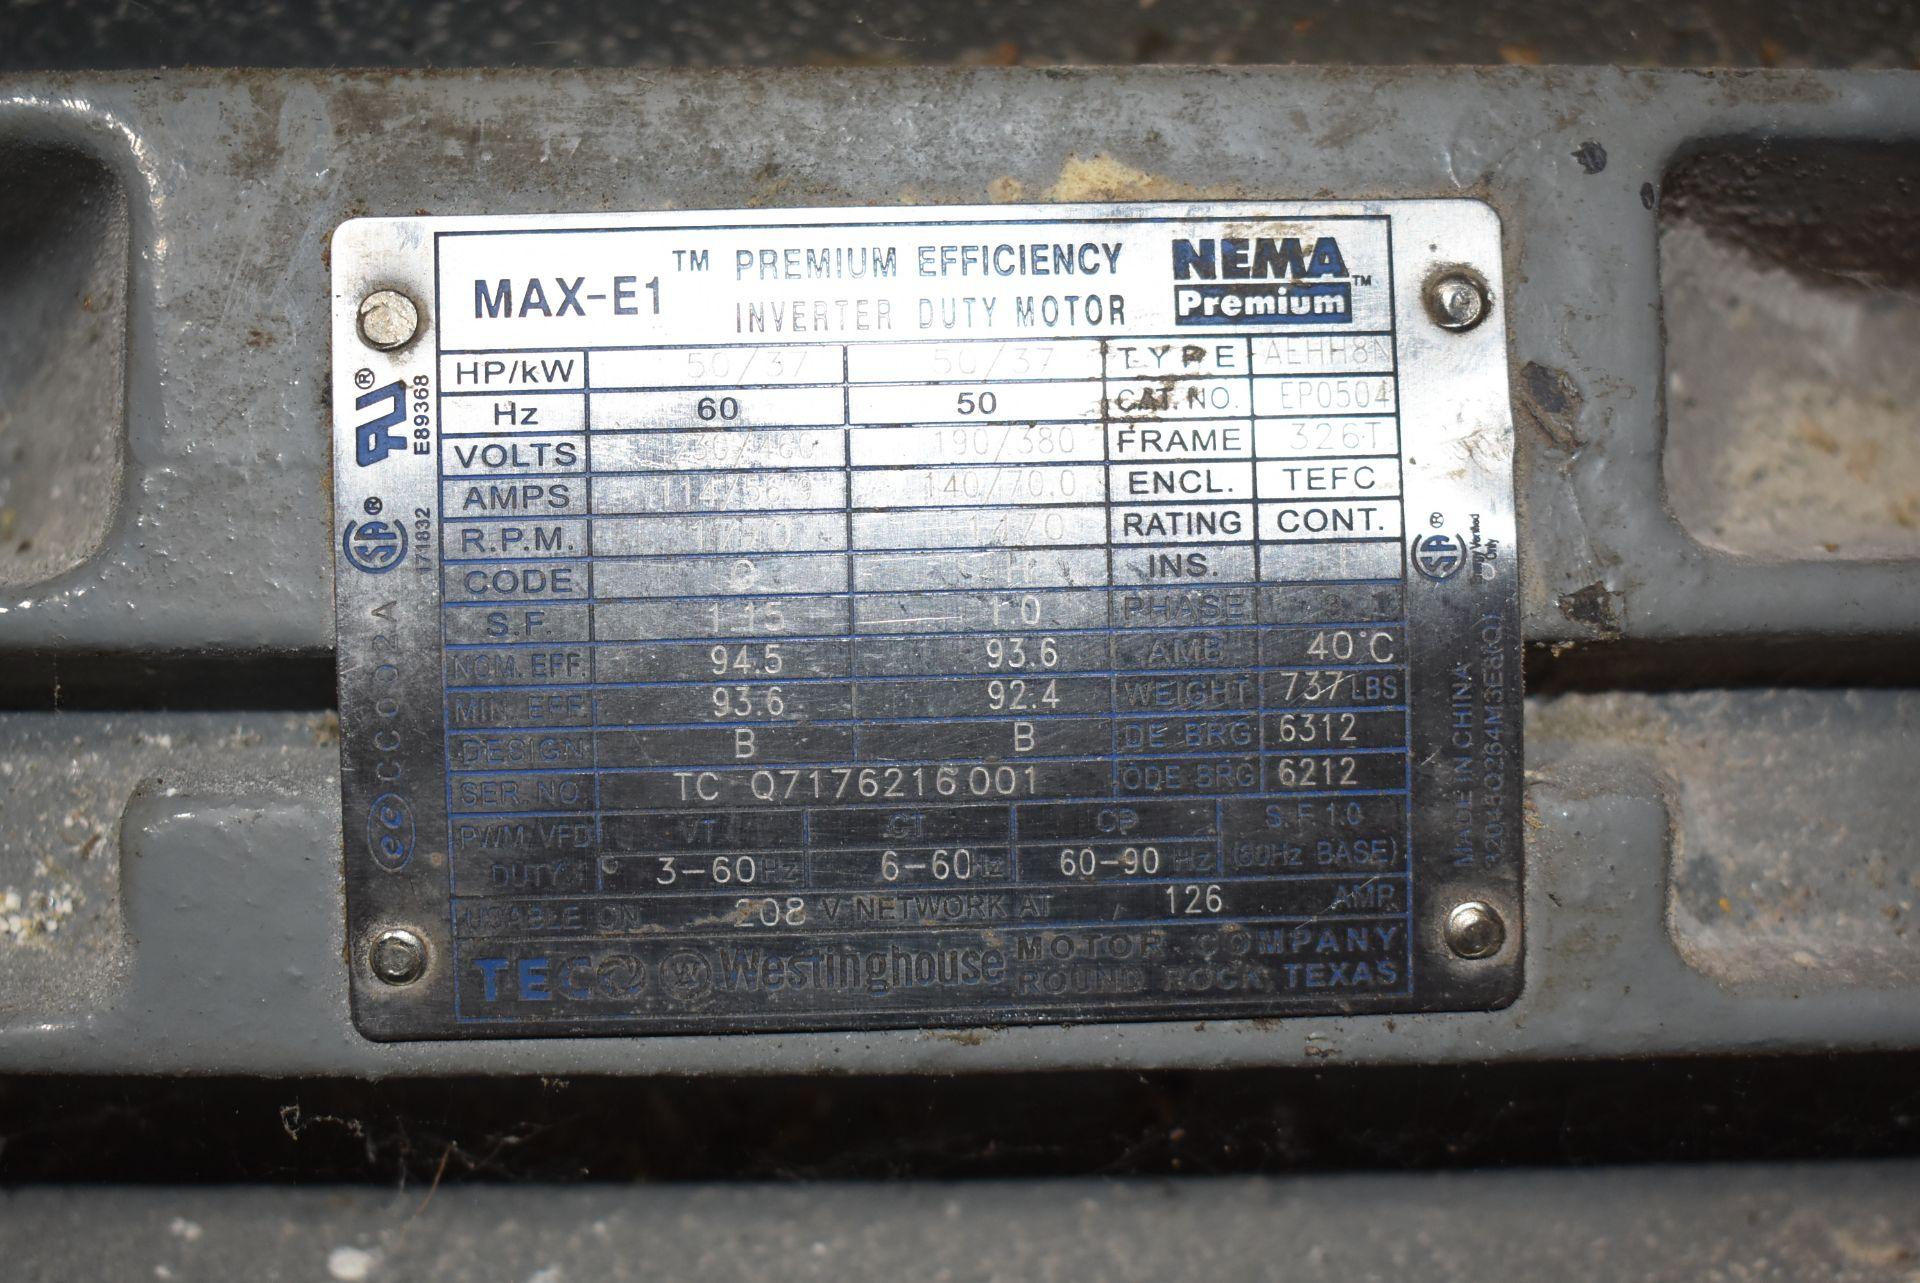 Westinghouse/TECO 50 HP Motor, 230/460 Volt, 1770 RPM - Image 2 of 2